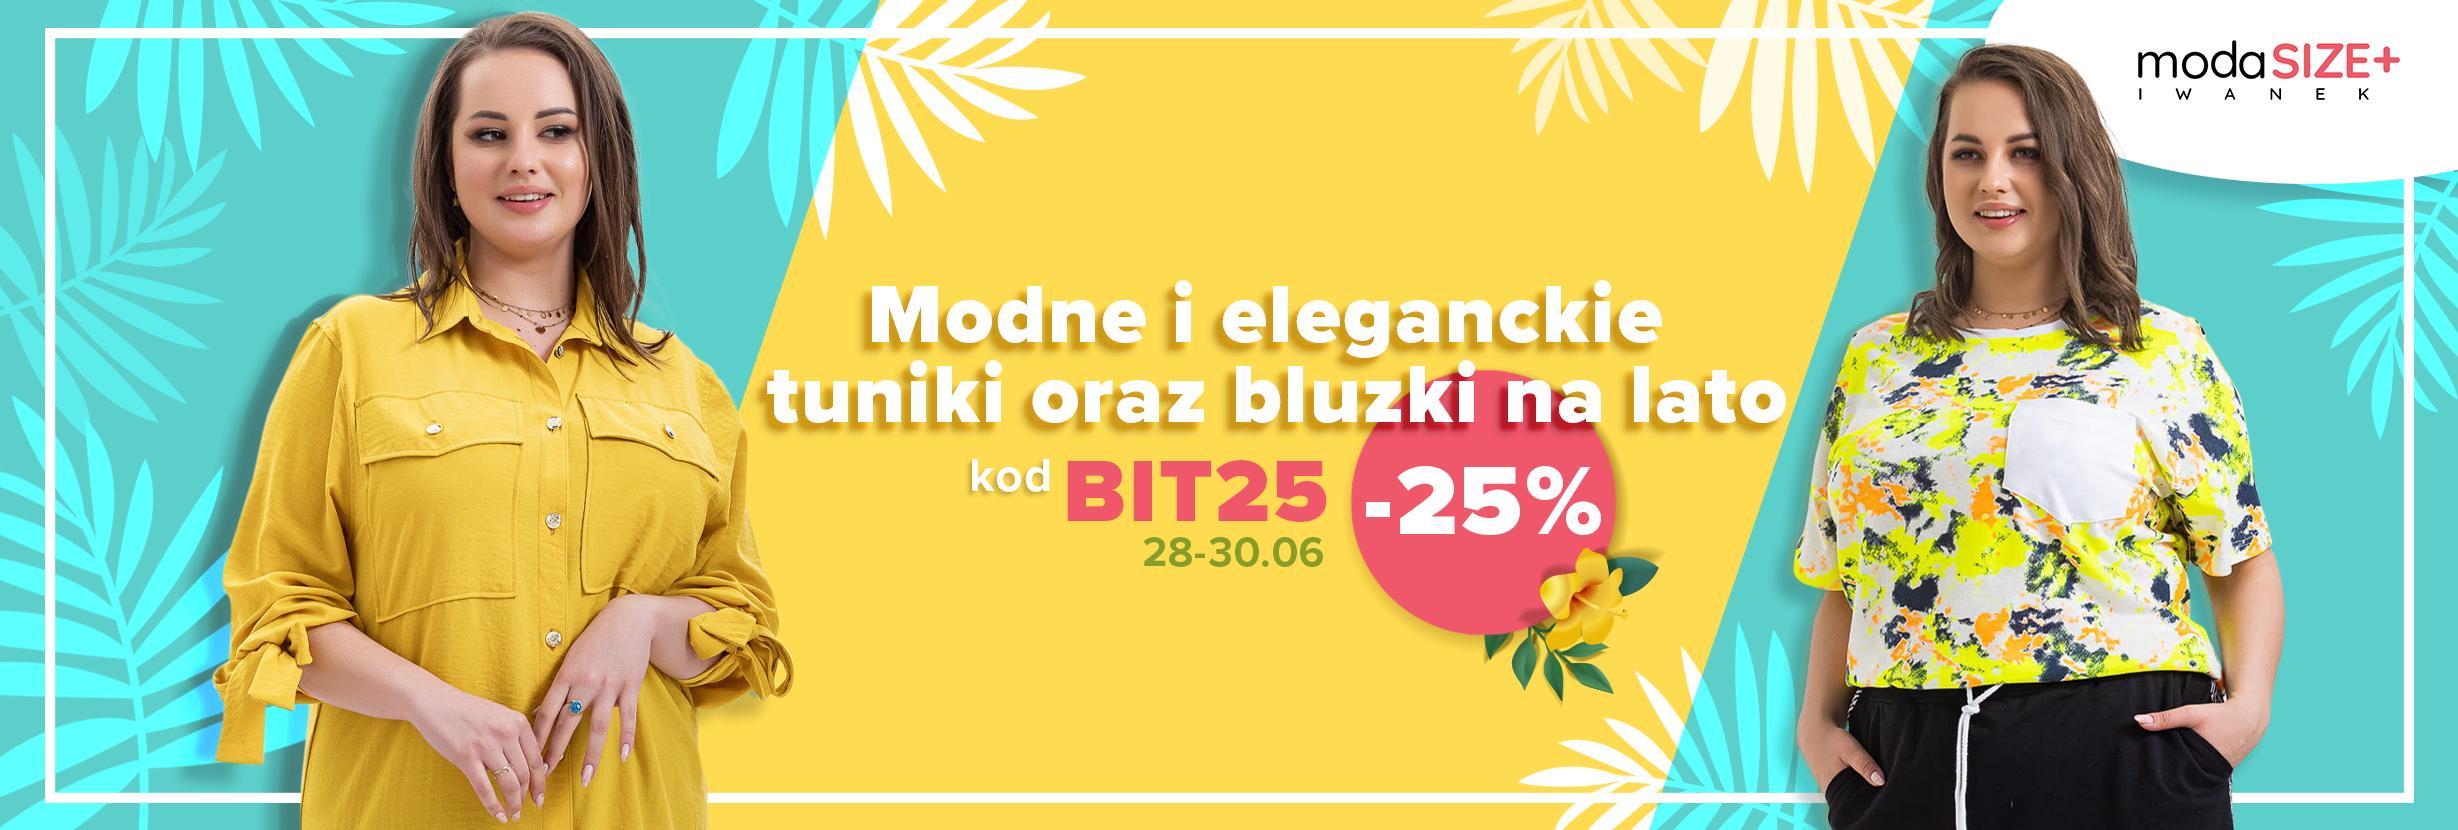 Moda Size Plus Moda Size Plus: 25% zniżki na modne i eleganckie tuniki oraz bluzki na lato